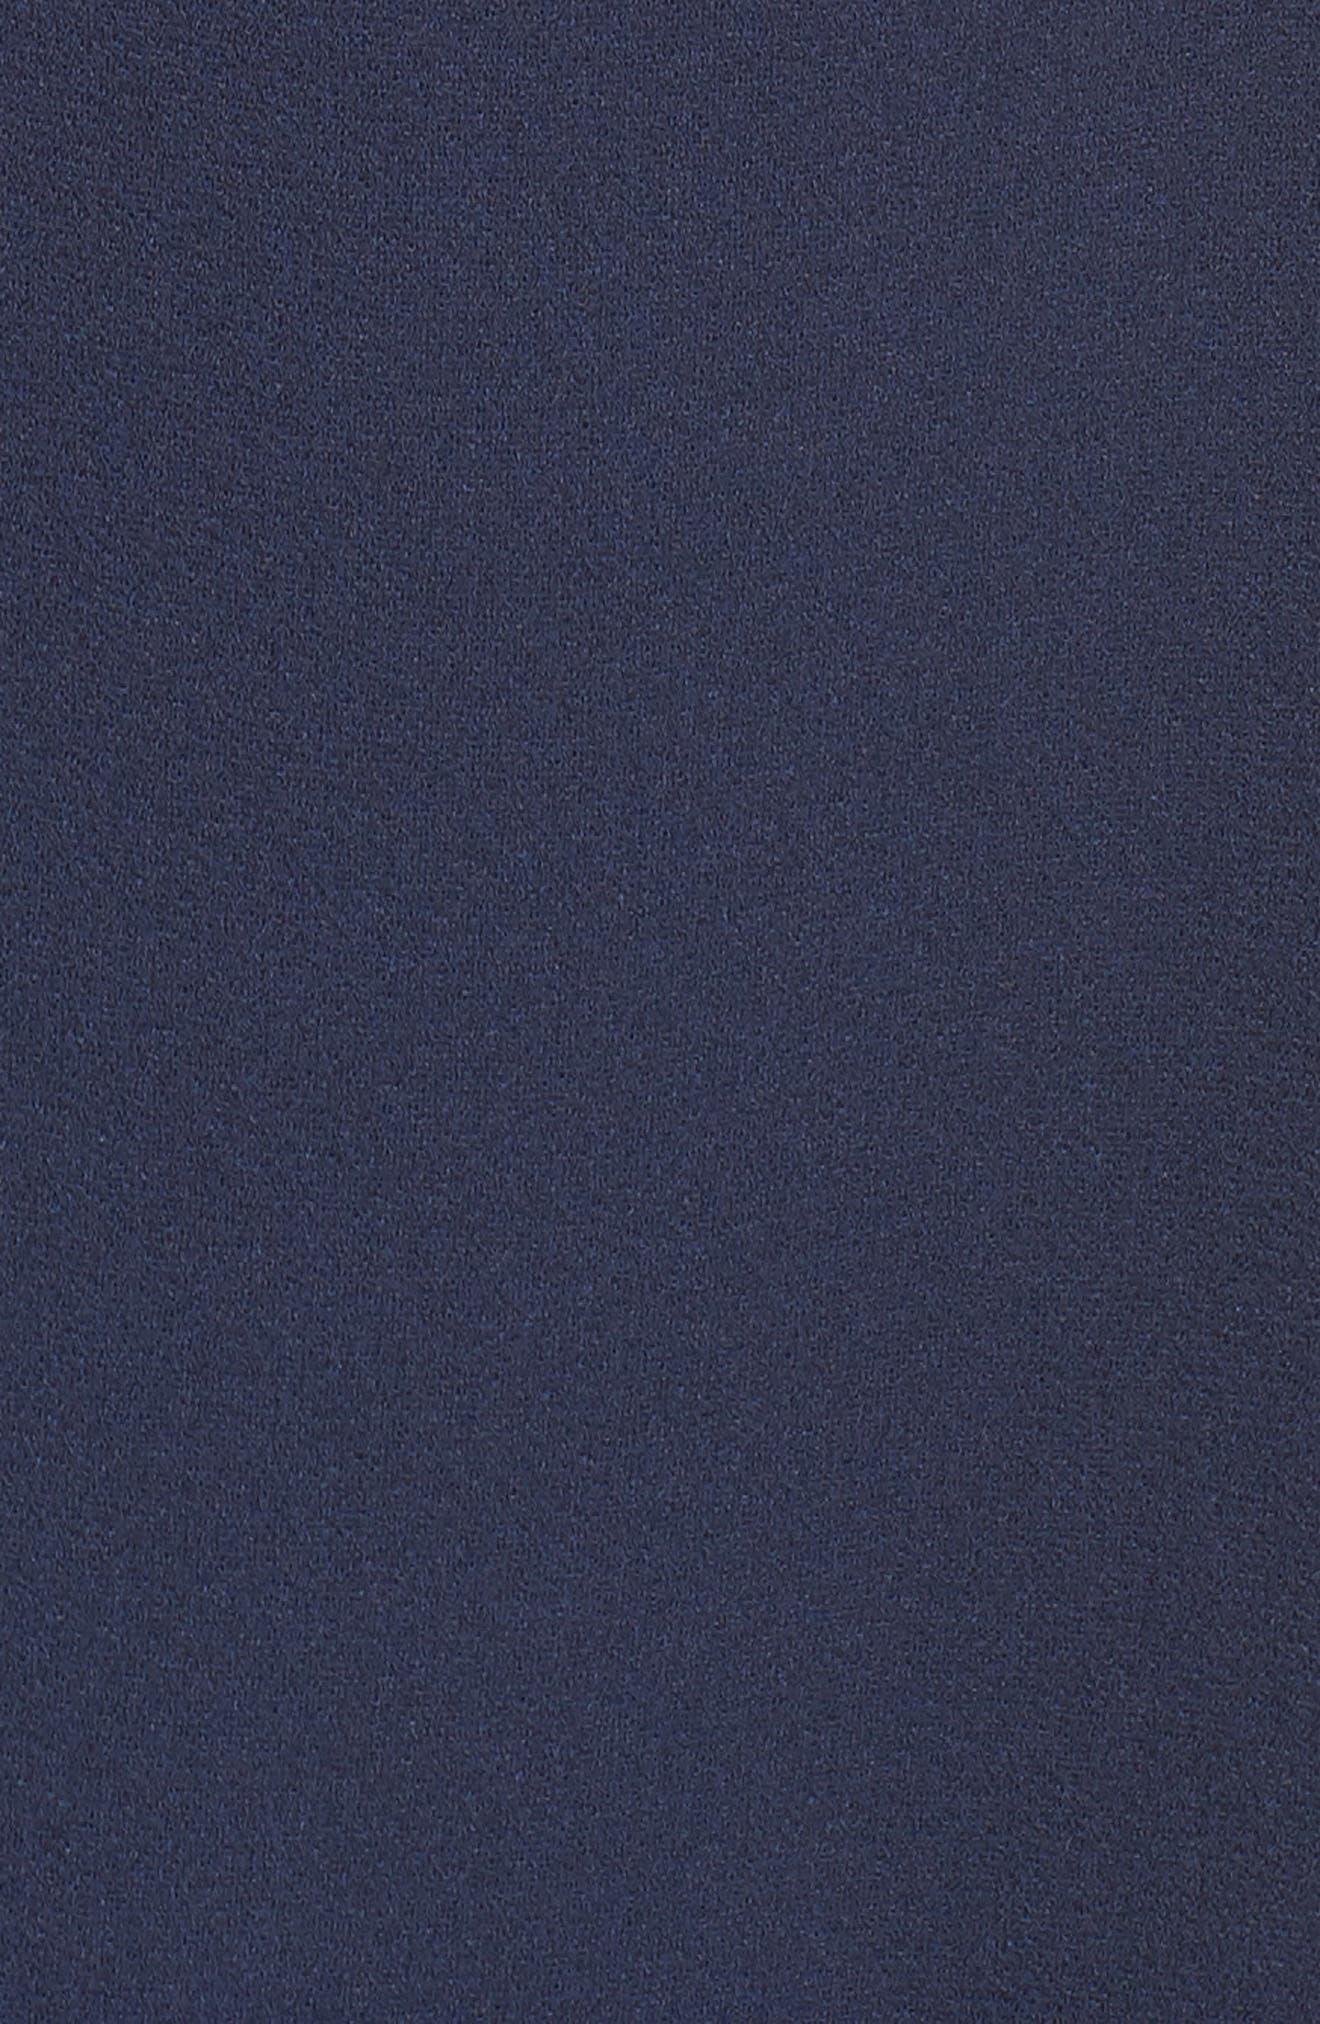 Tiered Ruffle Shift Dress,                             Alternate thumbnail 6, color,                             Navy